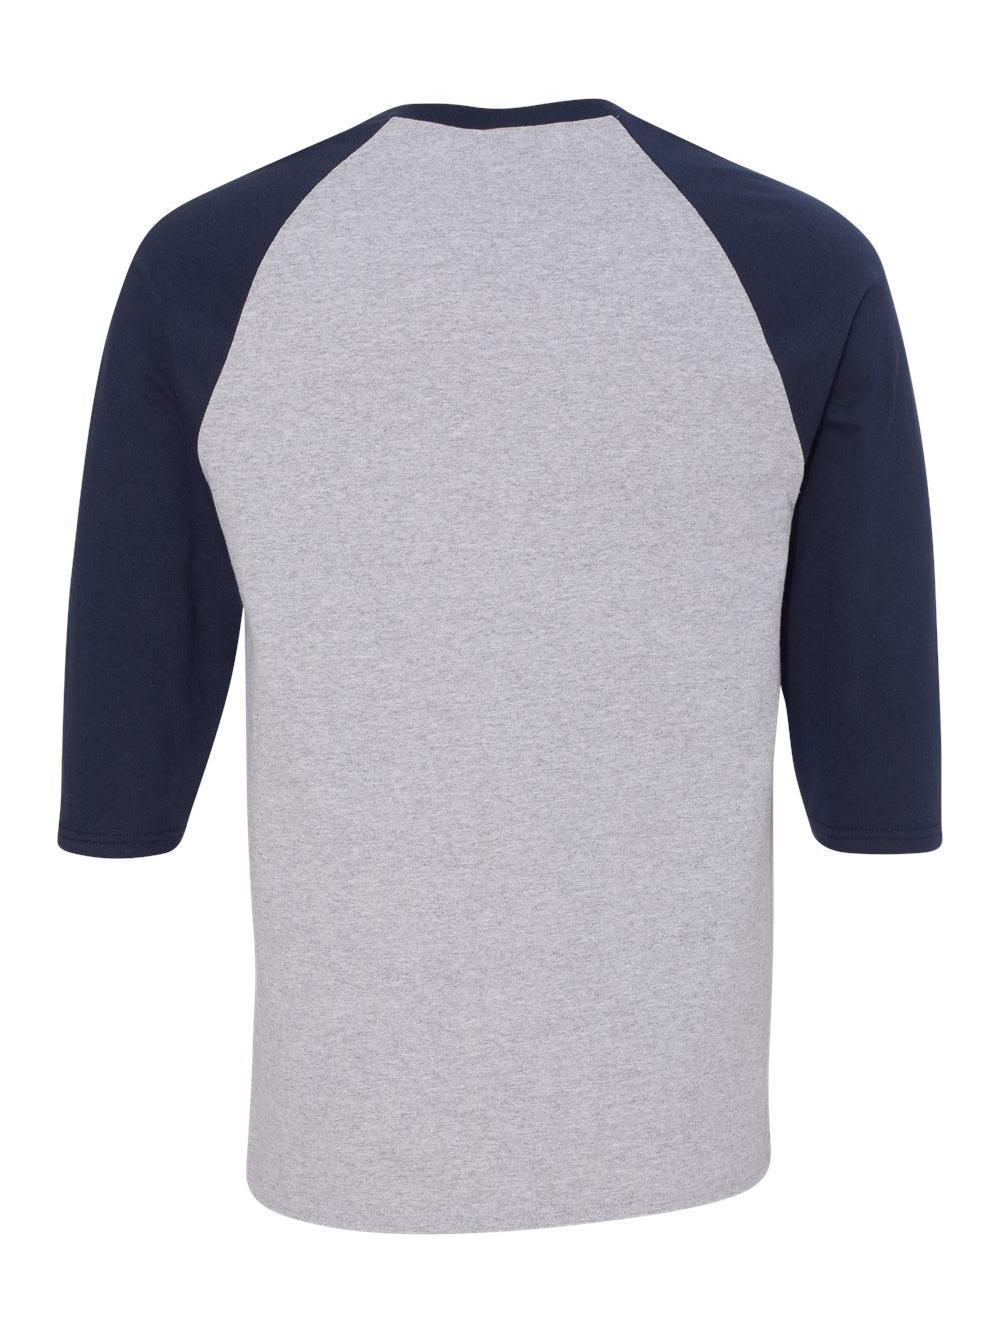 Gildan-Heavy-Cotton-Three-Quarter-Raglan-Sleeve-Baseball-T-Shirt-5700 thumbnail 10